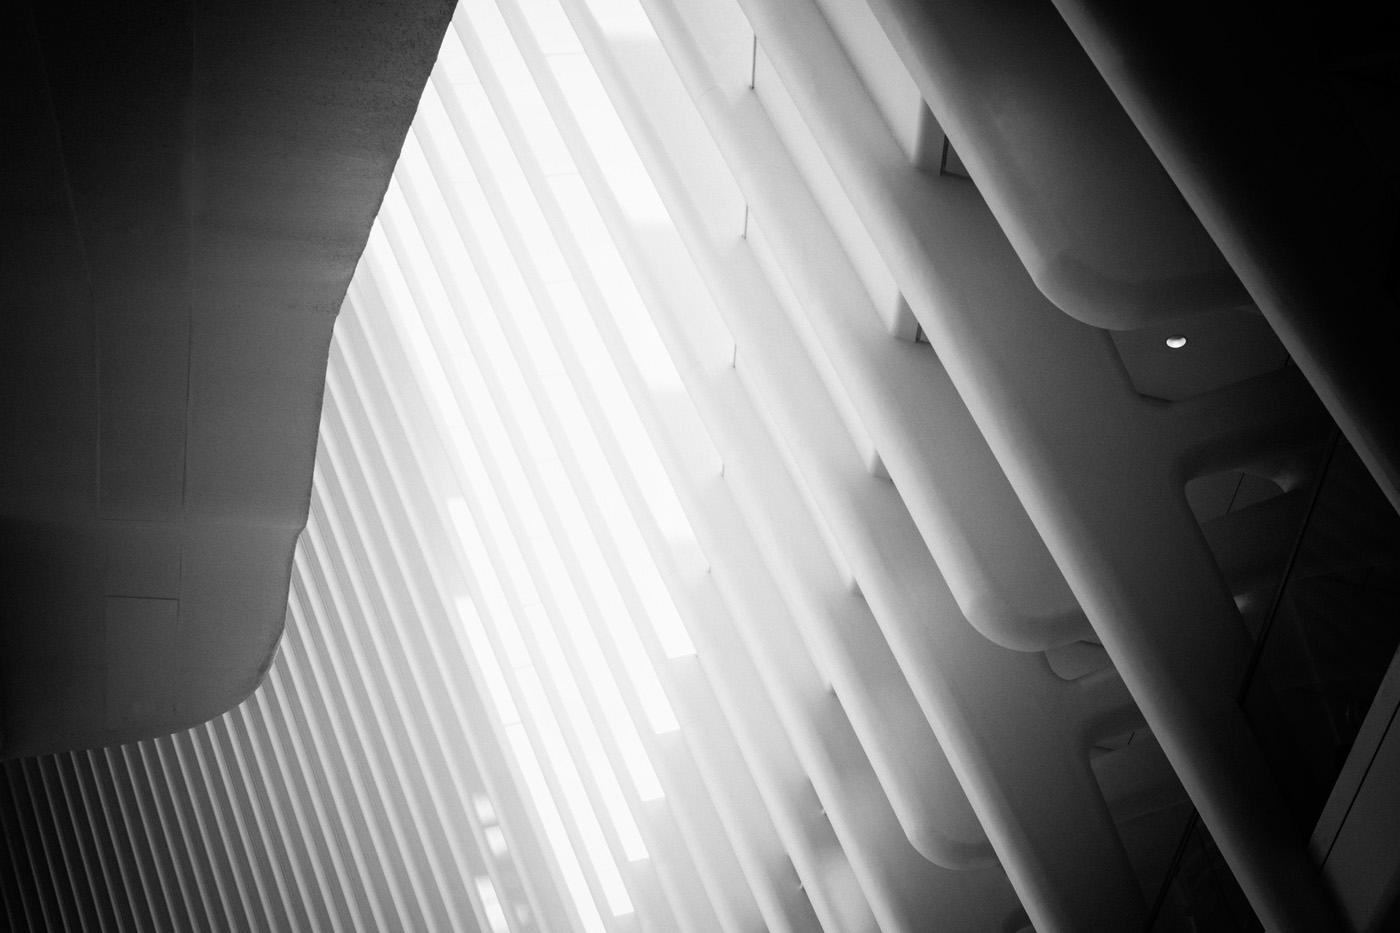 Oculus © Danica O. Kus